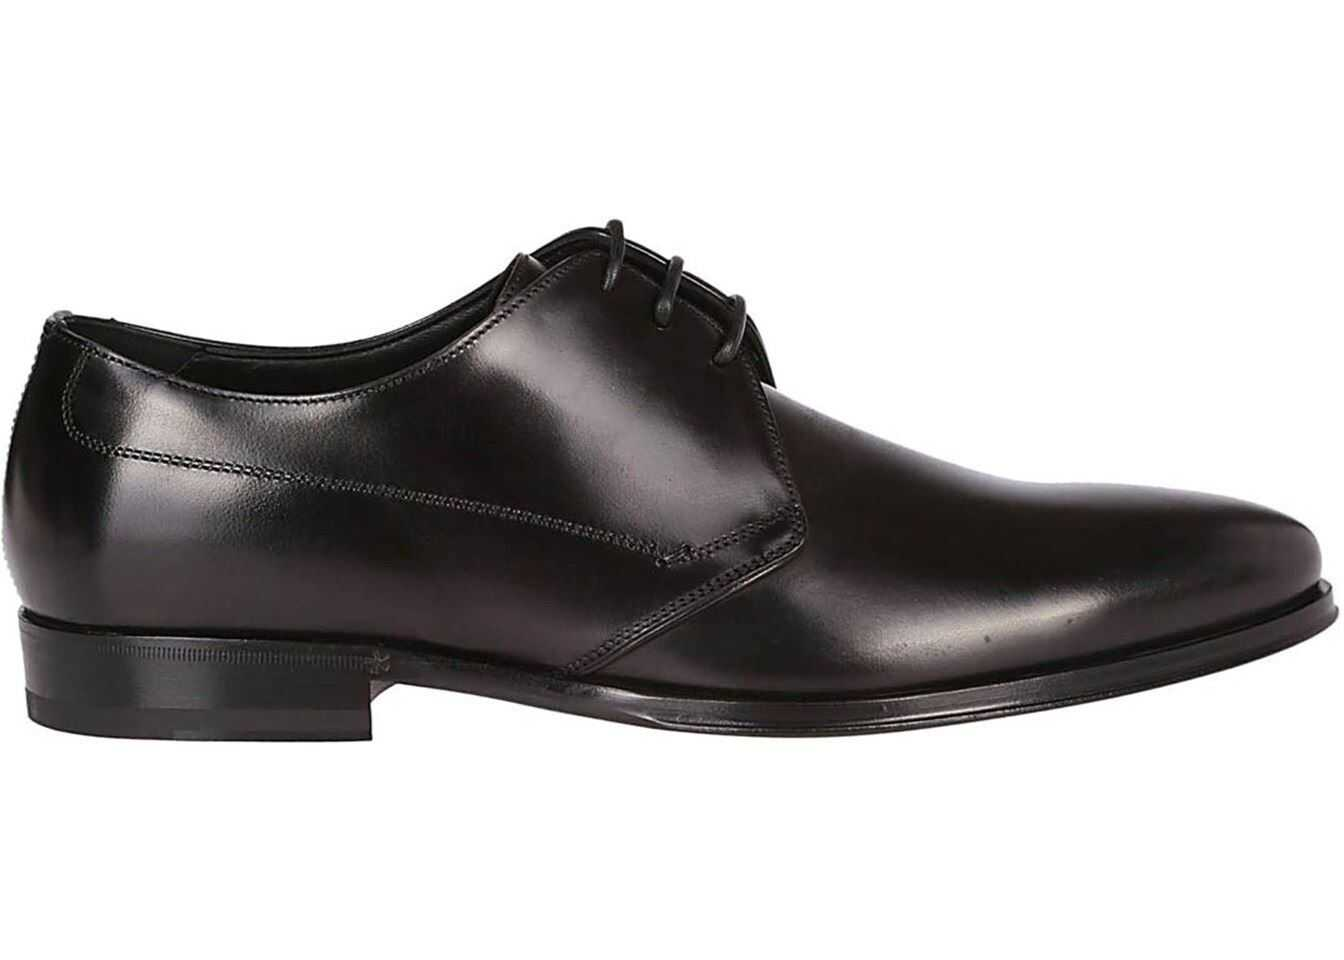 Dolce & Gabbana Smooth Leather Black Derby Shoes In Black A10391AZ63180999 Black imagine b-mall.ro